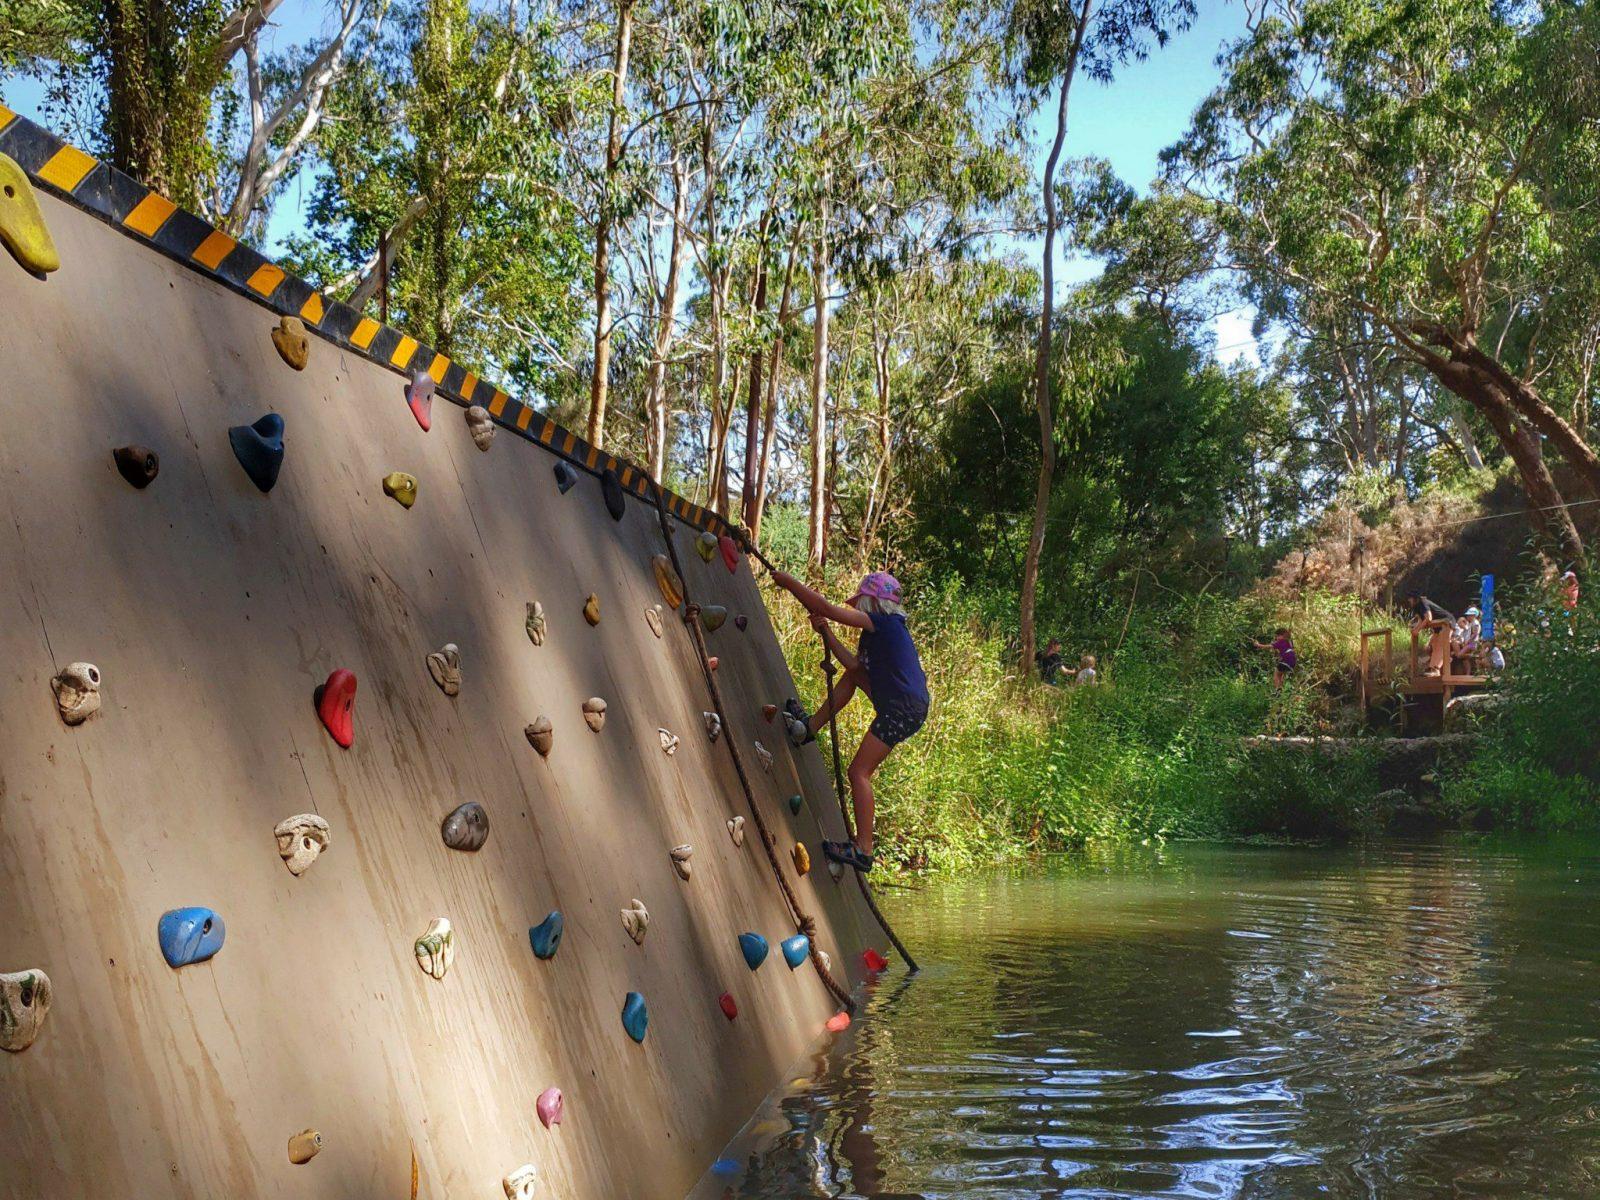 'Wade & Climb' Obstacle